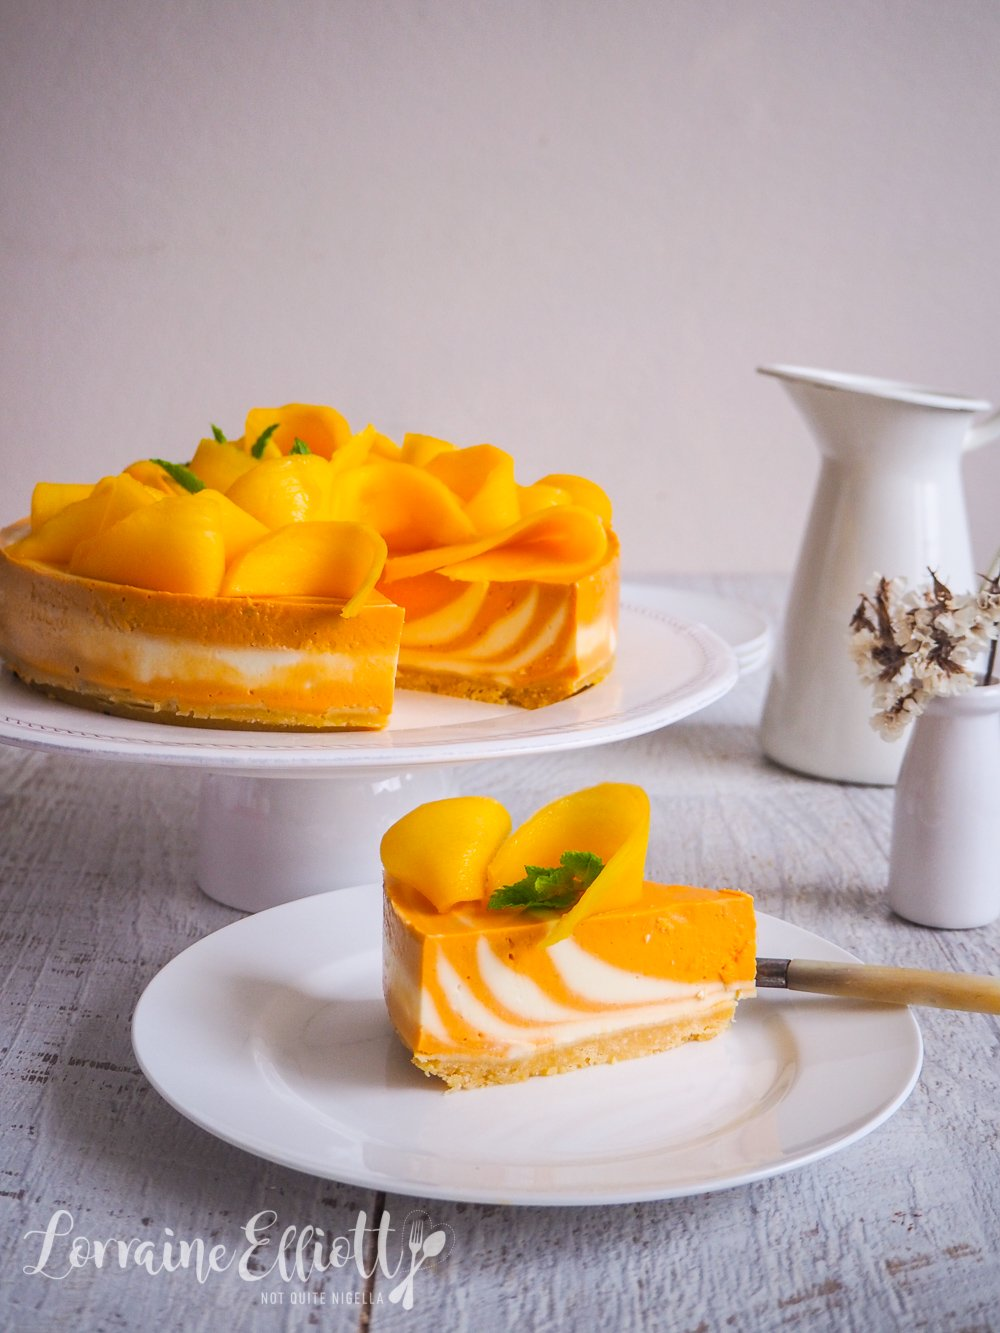 Mangoes & Cream Zebra Striped Cheesecake